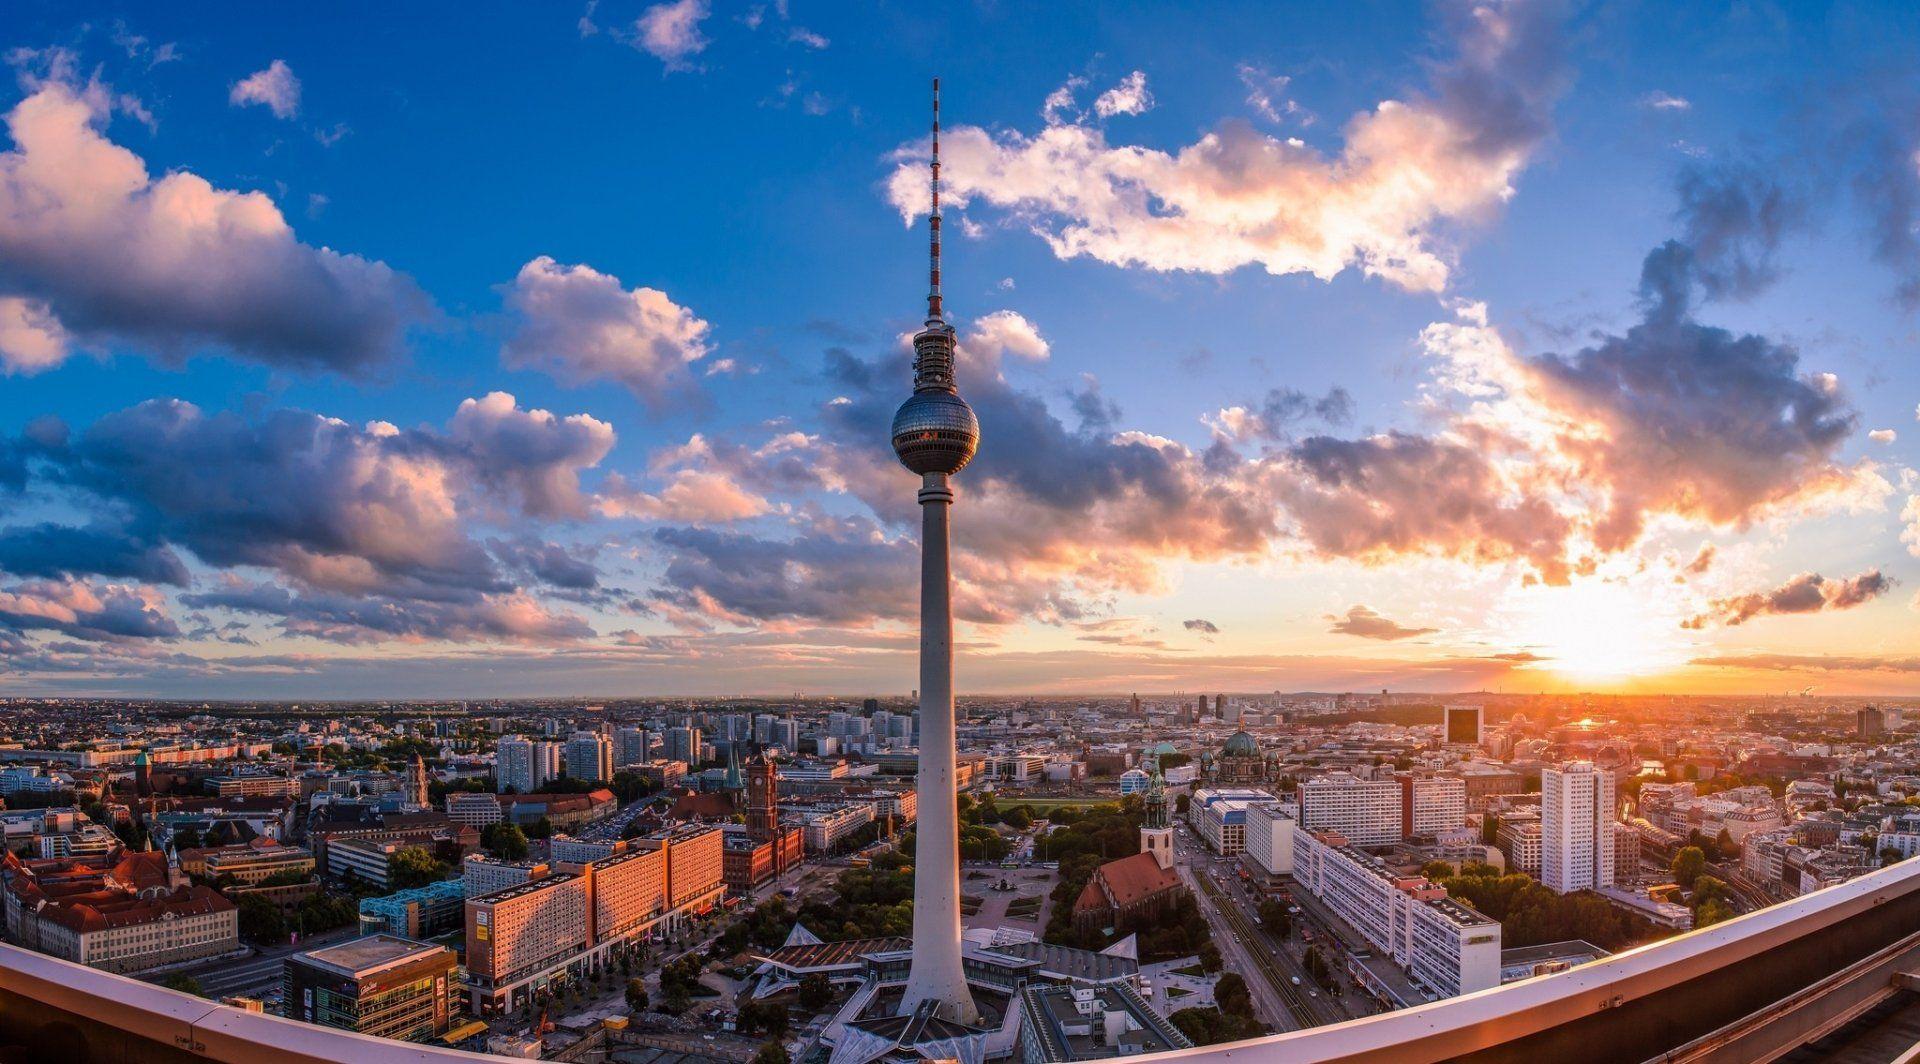 Man Made Berlin Germany Sunset Wallpaper Background Images Sunset Wallpaper Desktop Background Images